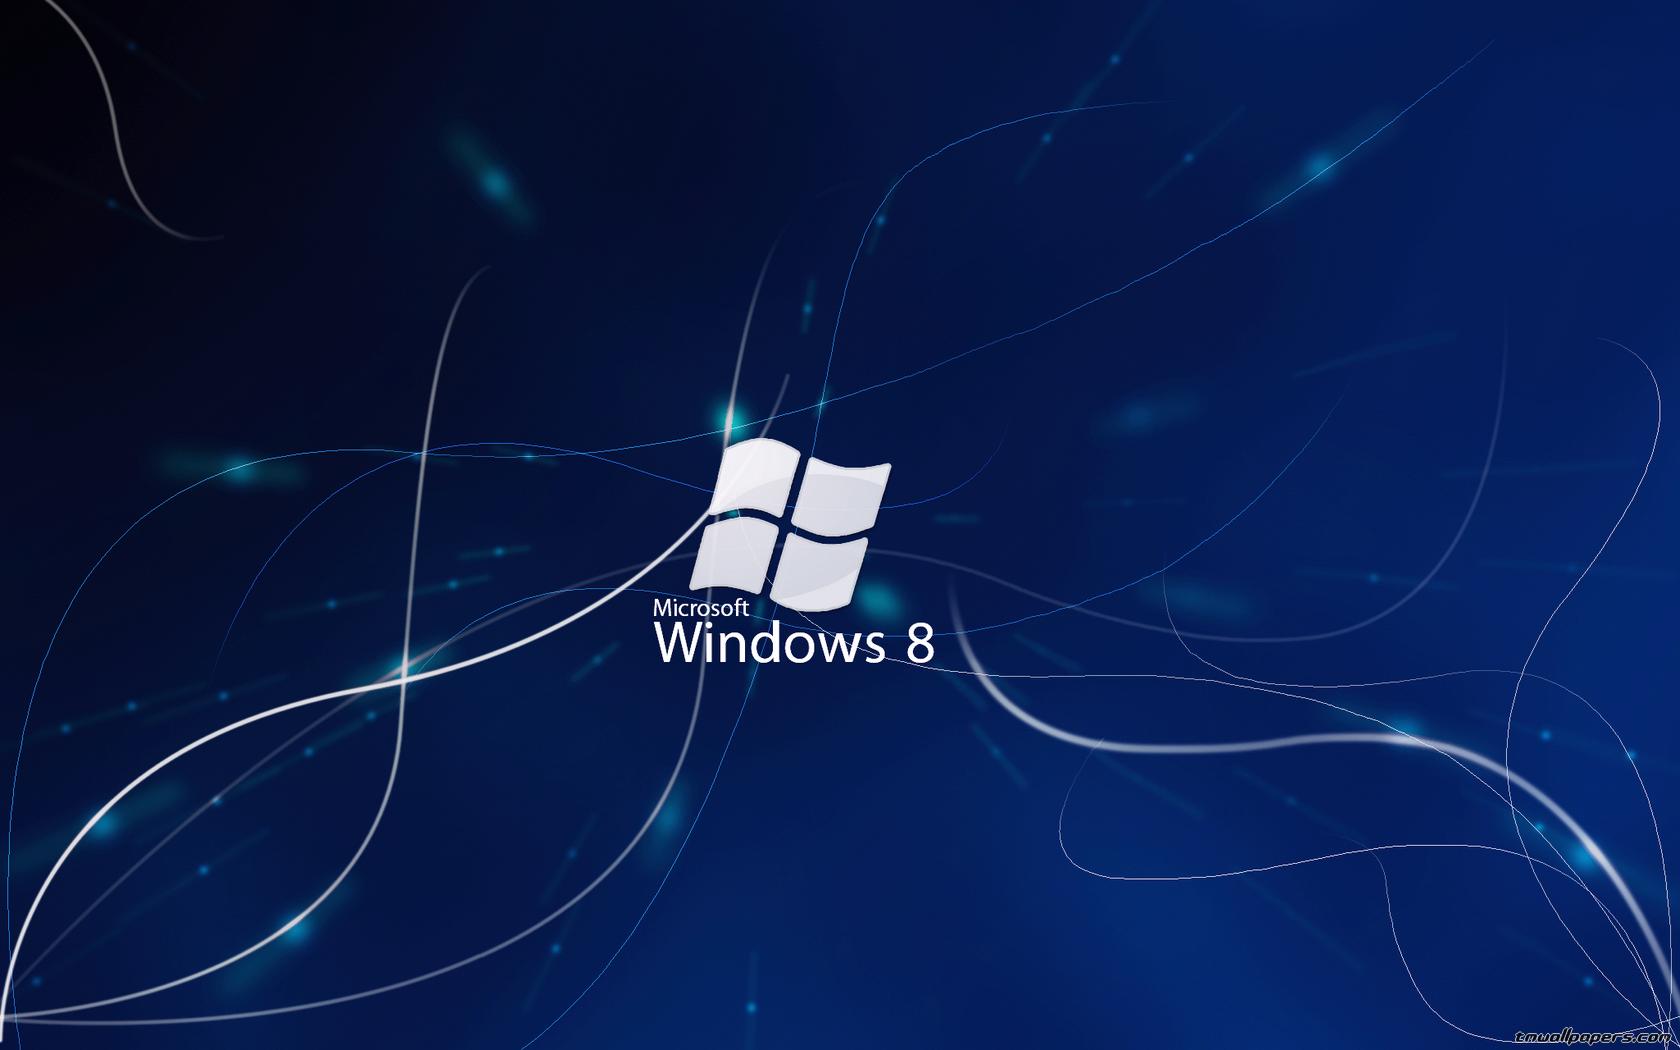 Pin 1680x1050 Windows 8 Desktop Pc And Mac Wallpaper on Pinterest